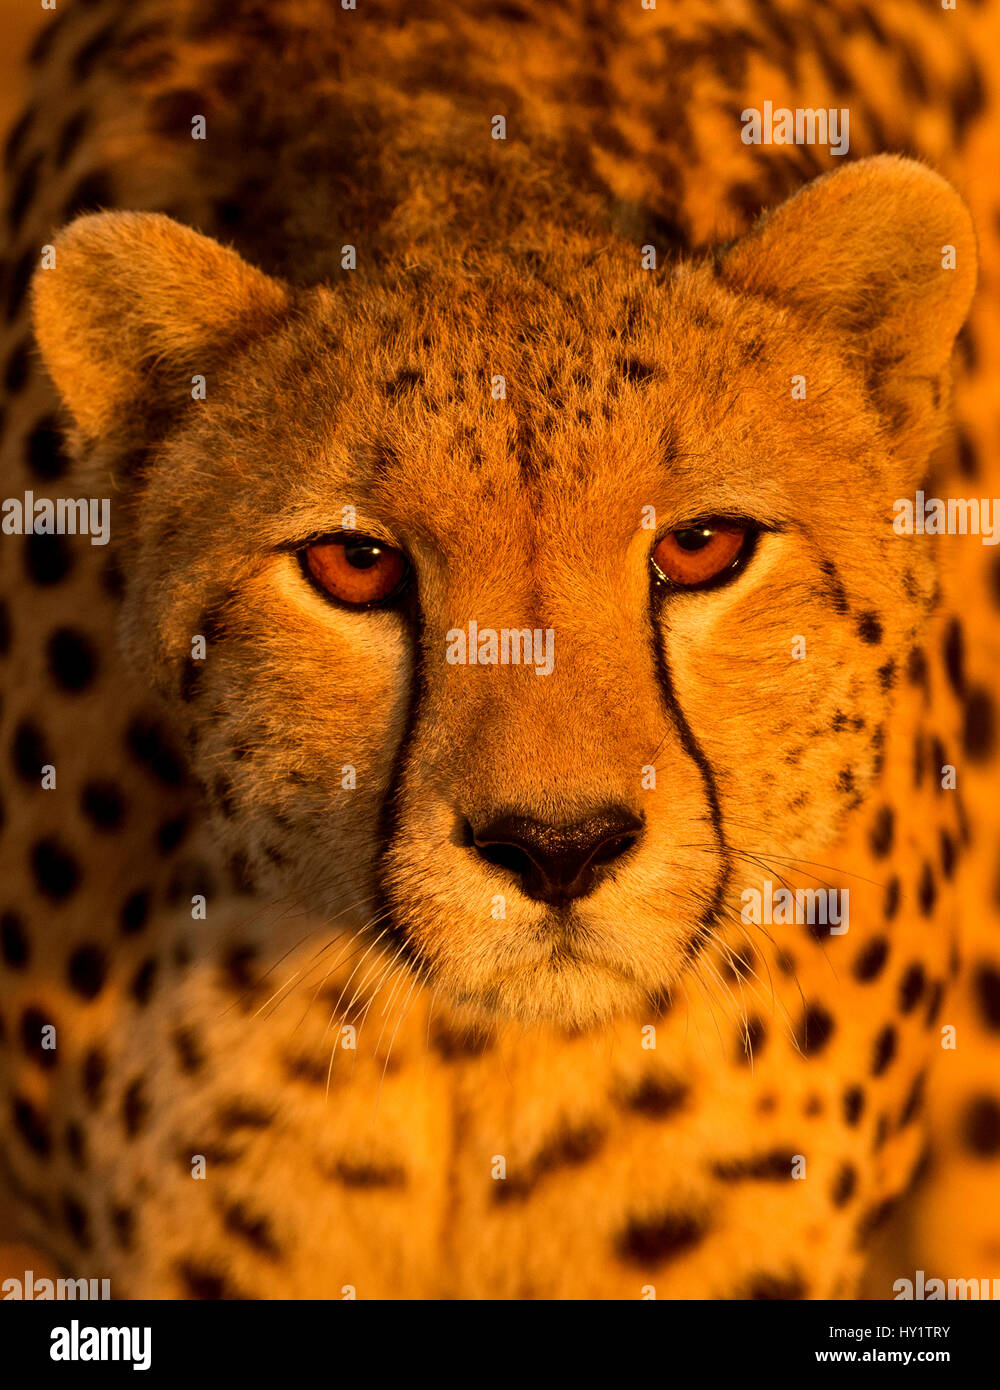 Cheetah Vertical Frame Stock Photos & Cheetah Vertical Frame Stock ...